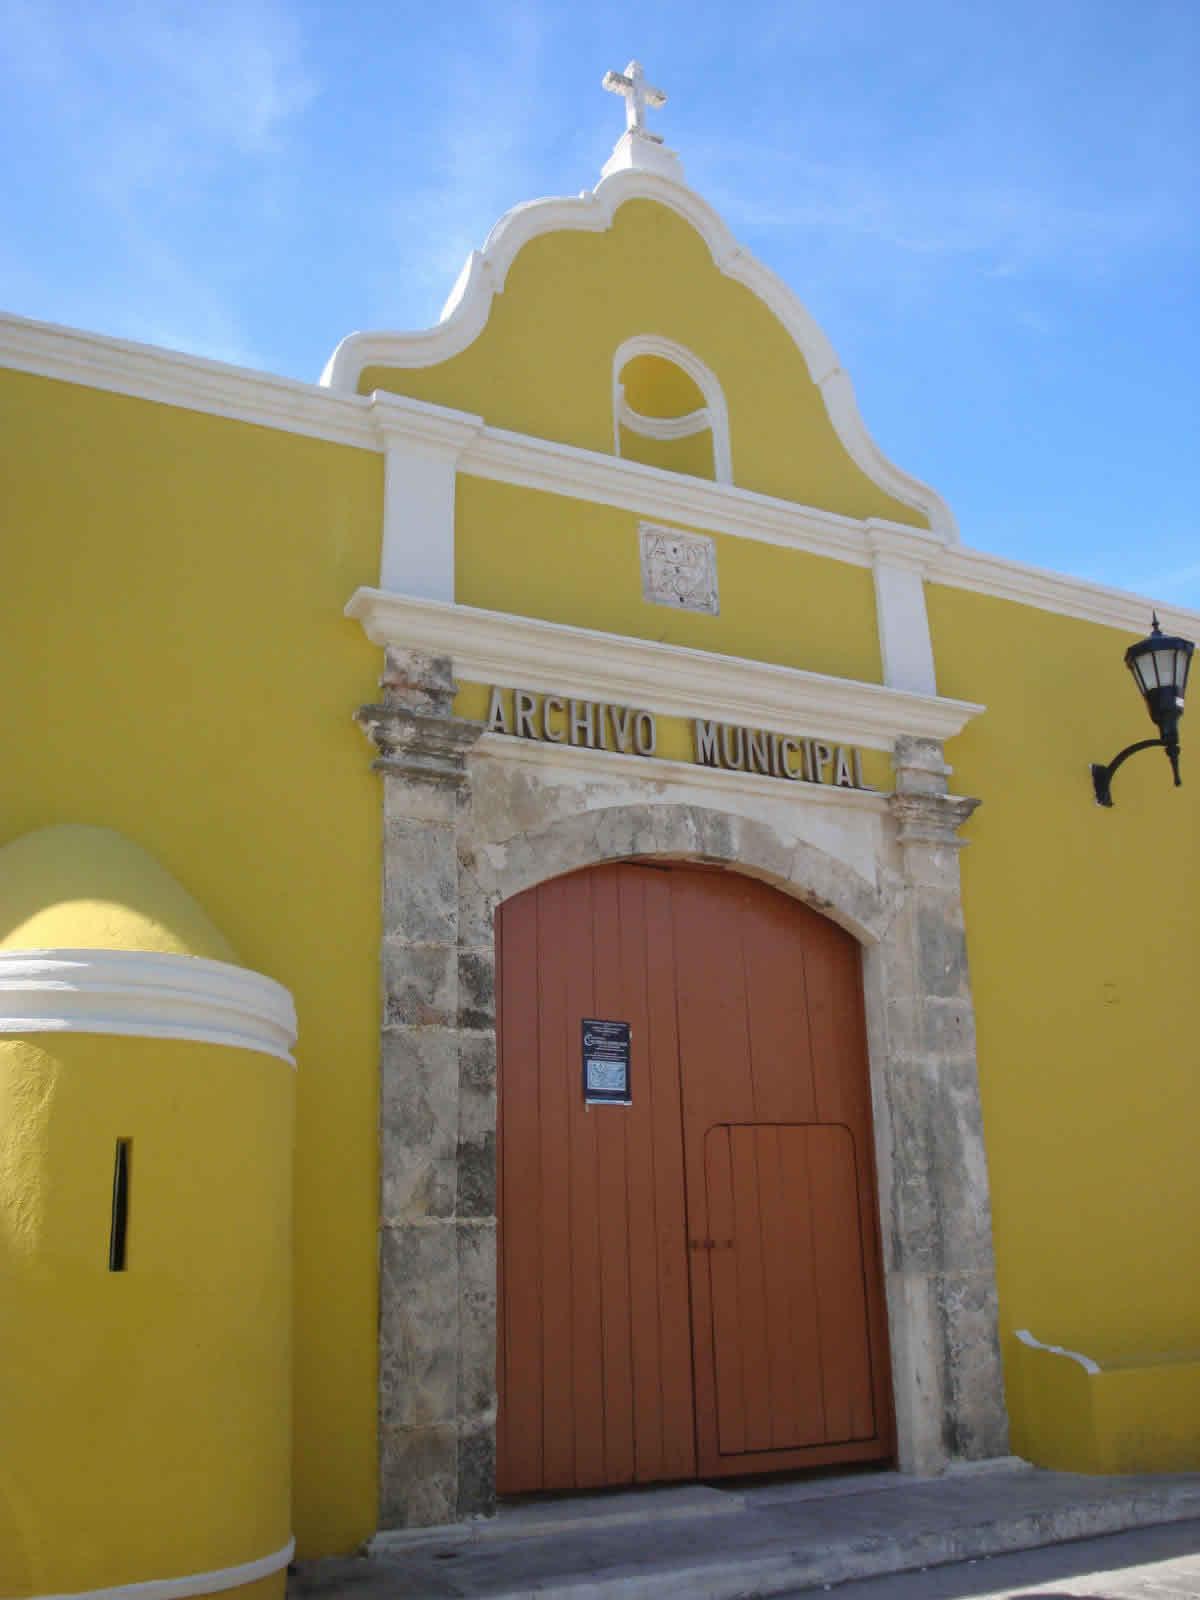 archivo municipal, campeche